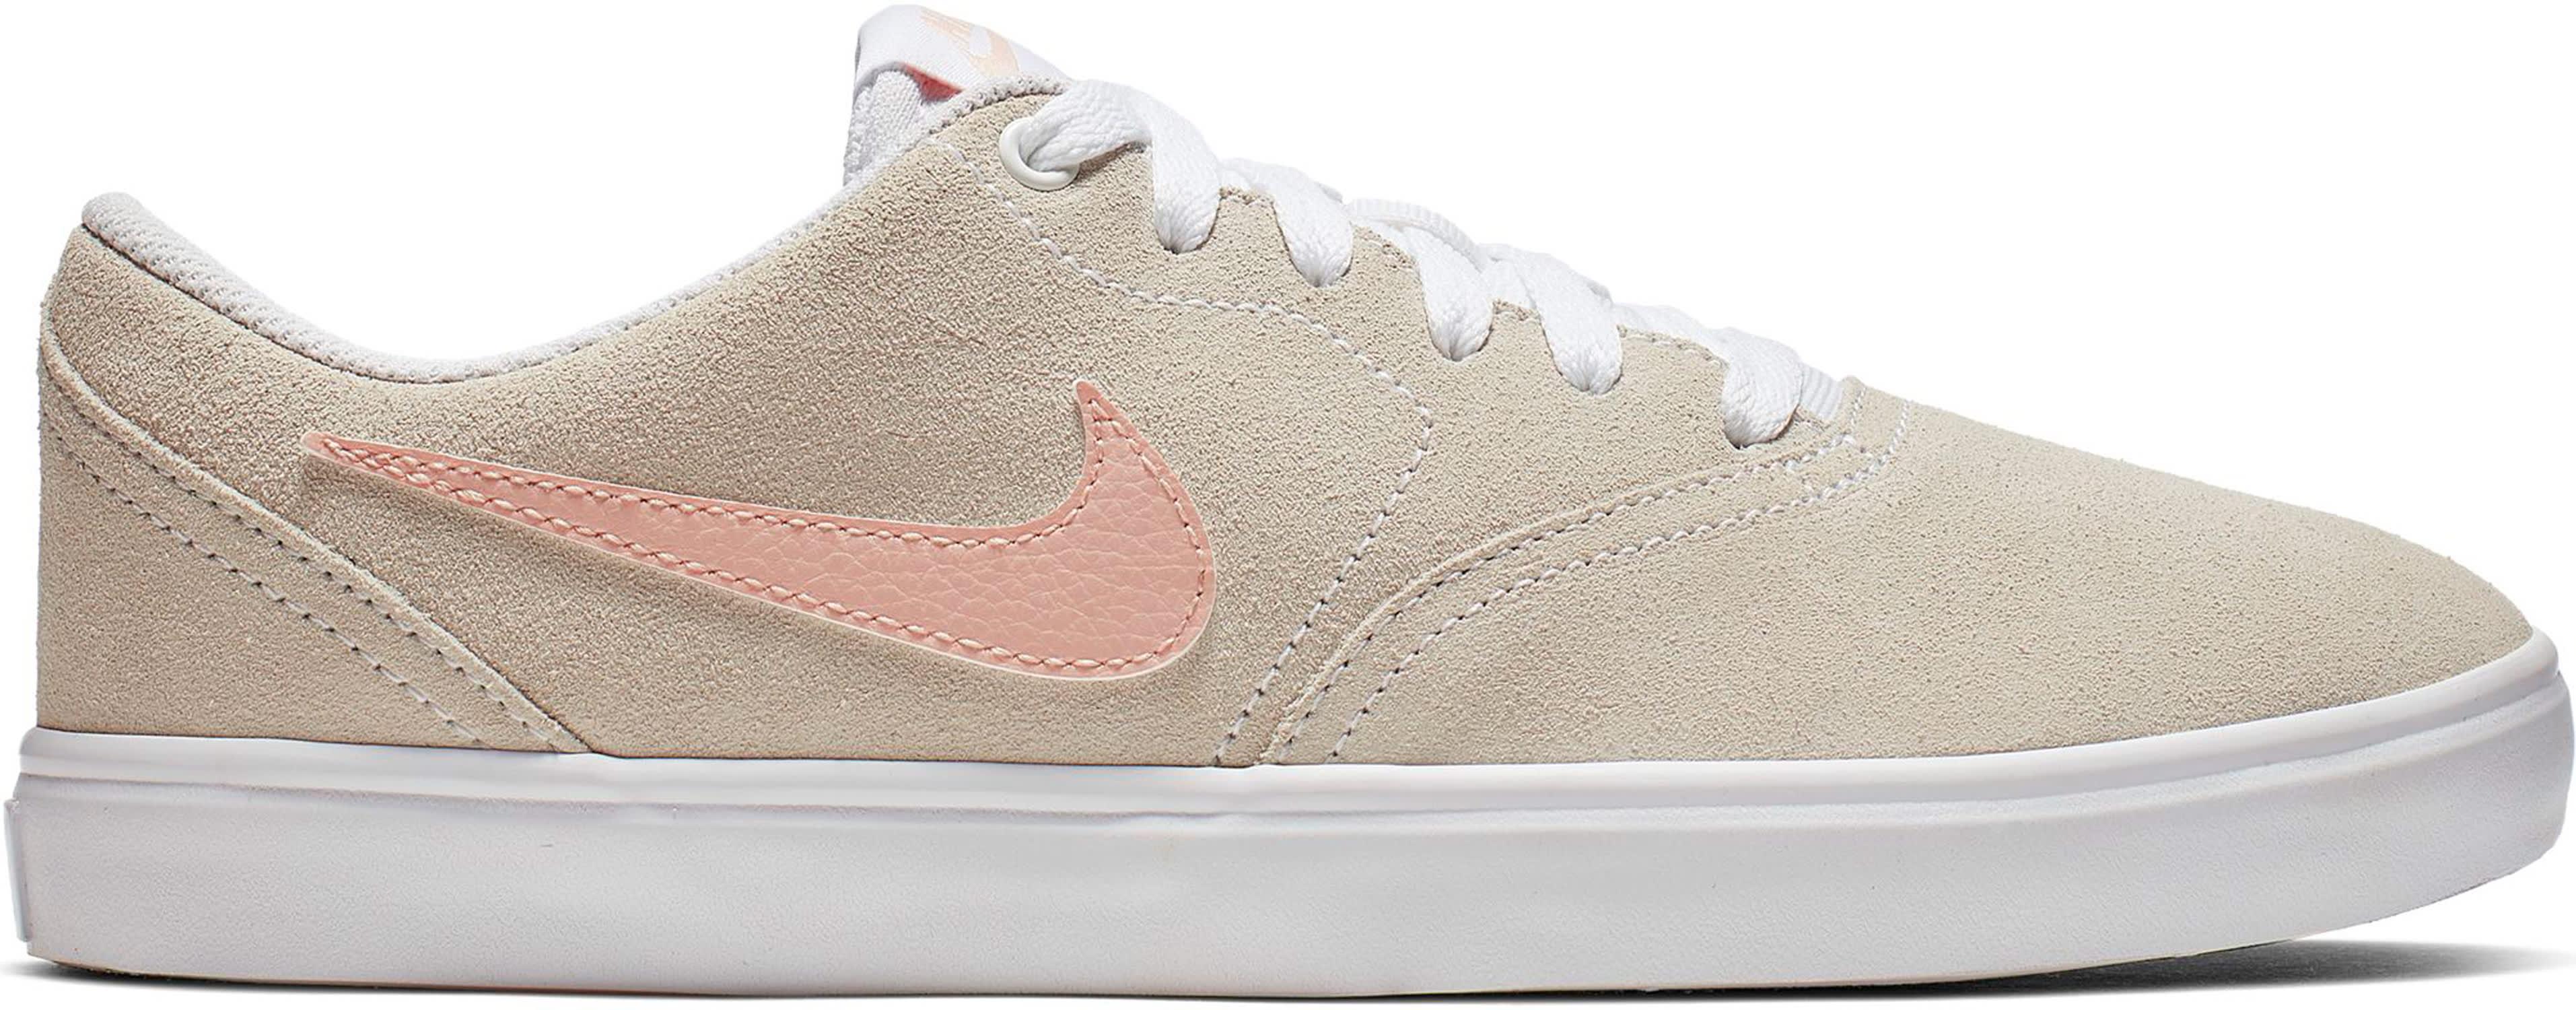 Nike SB Check Solarsoft Skate Shoes